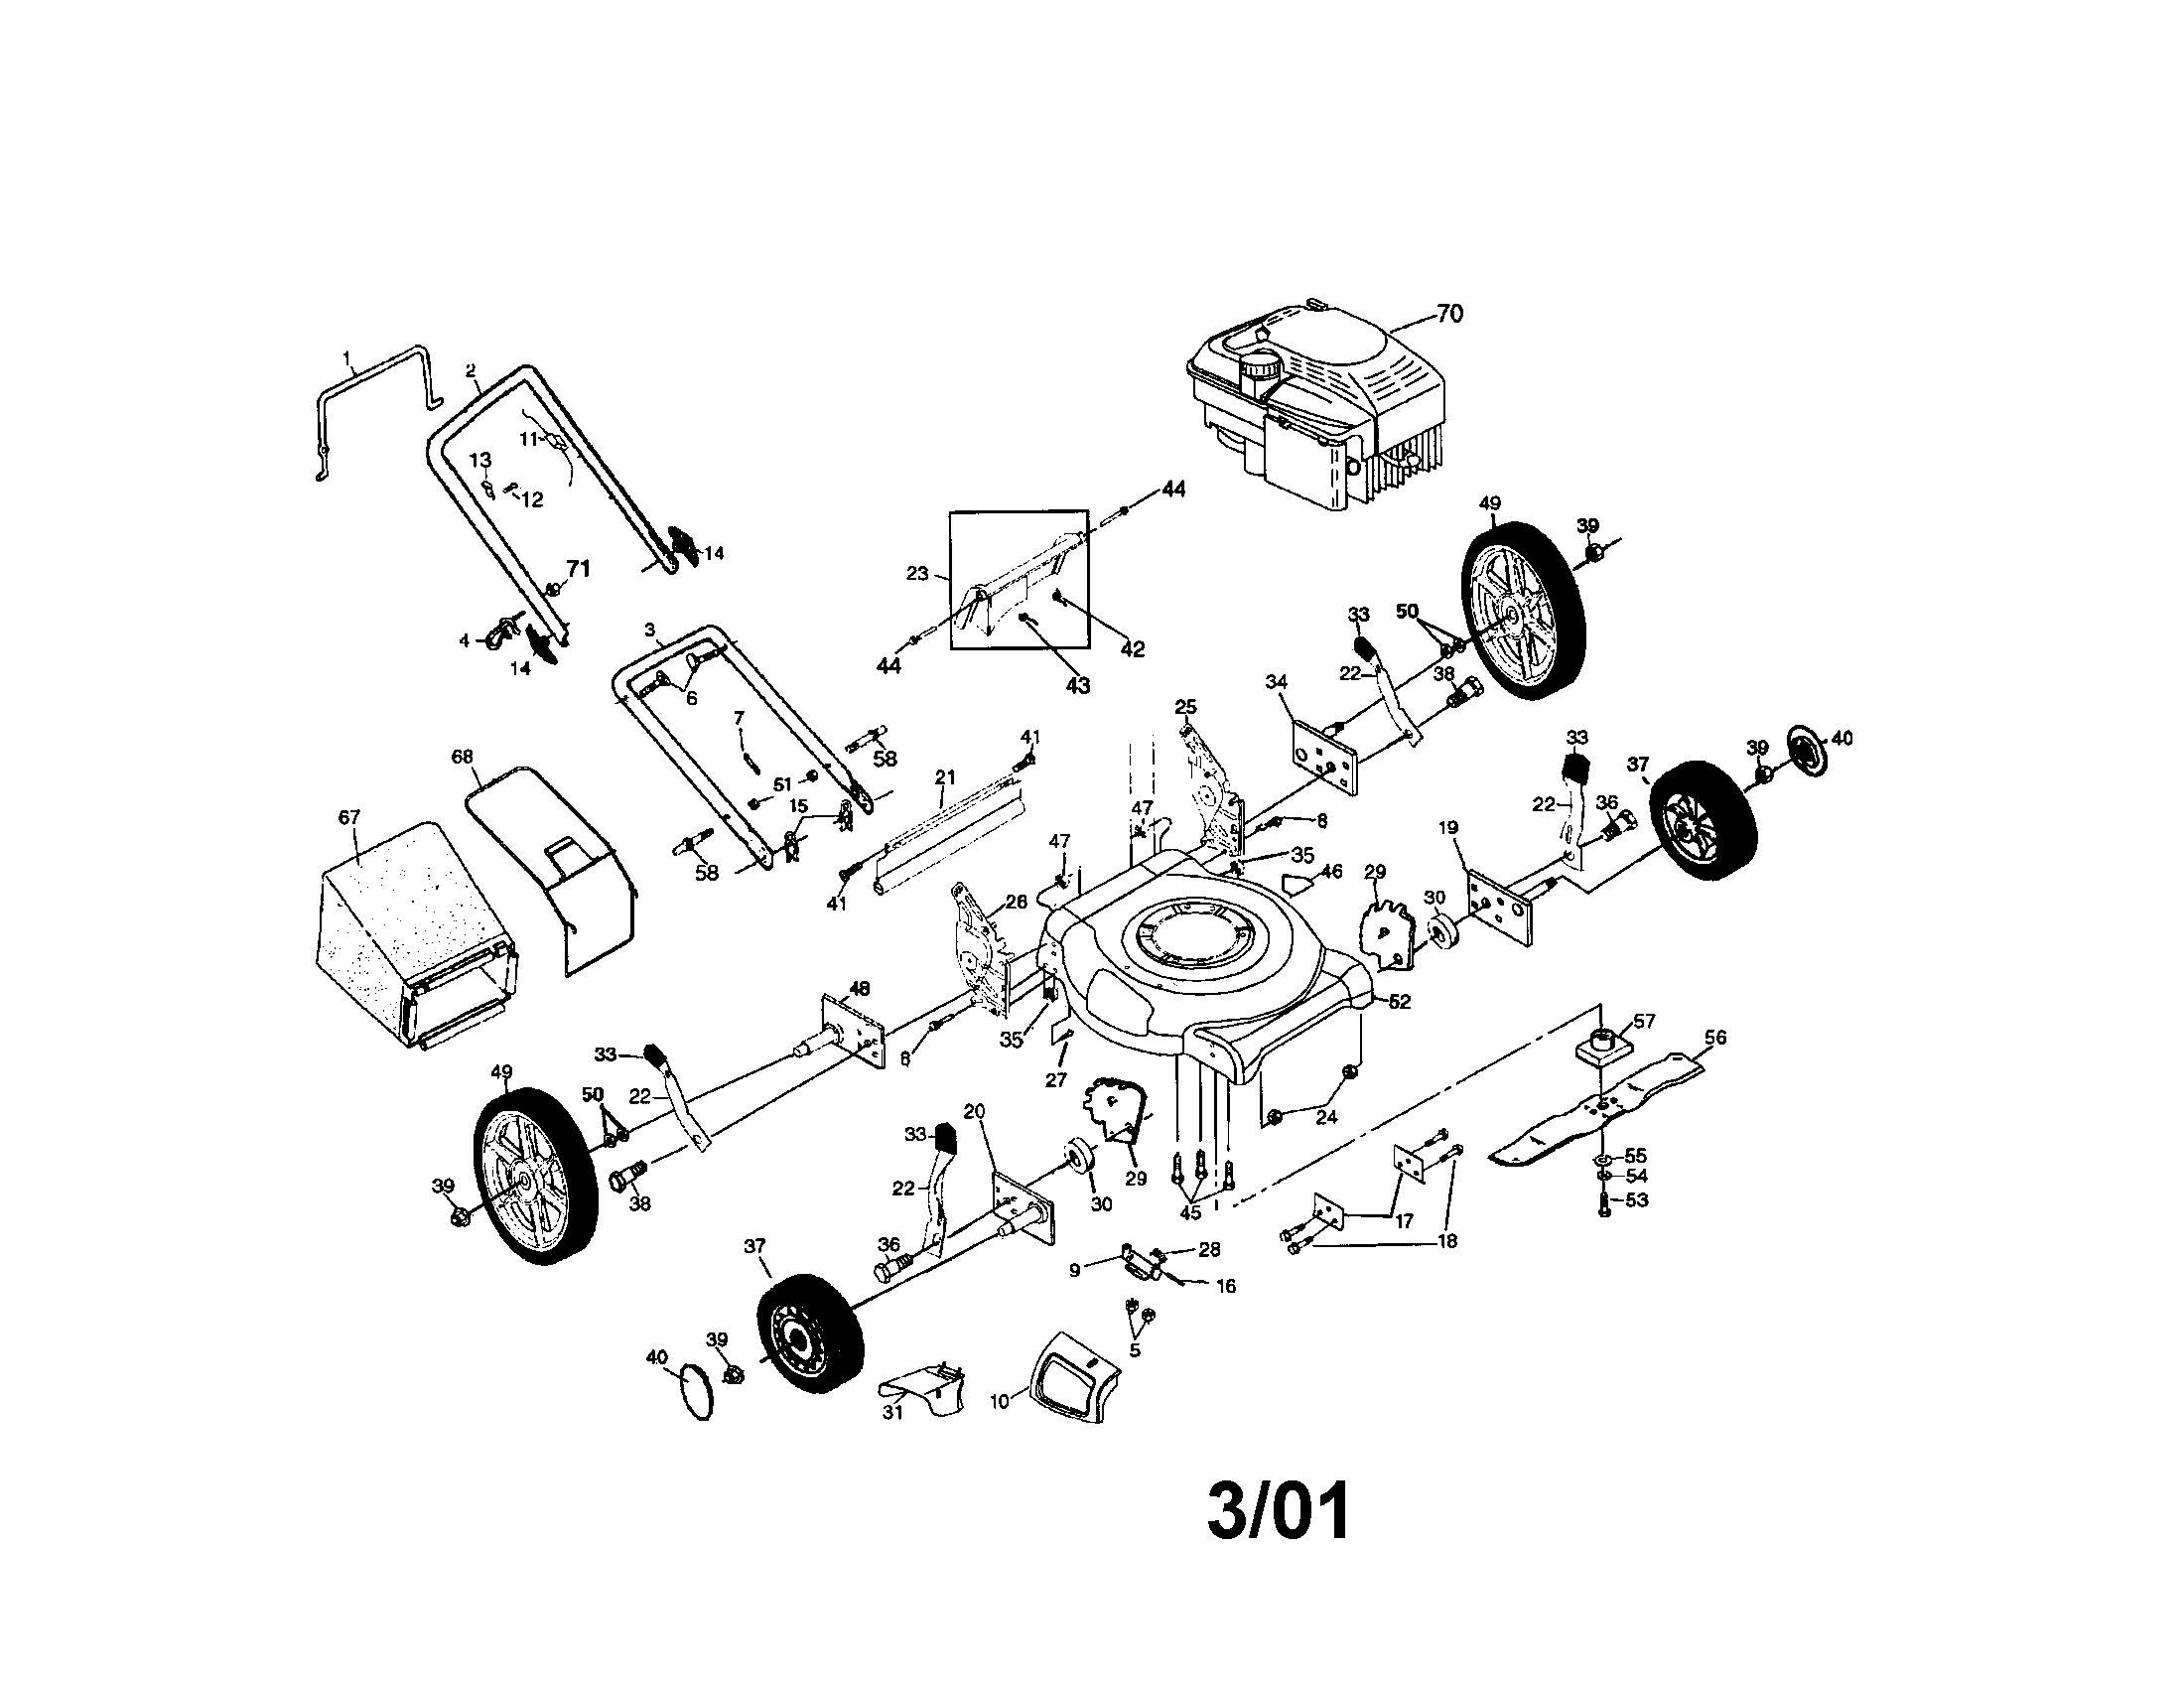 Rb 1150  Craftsman Lawn Mower Engine Parts Diagram